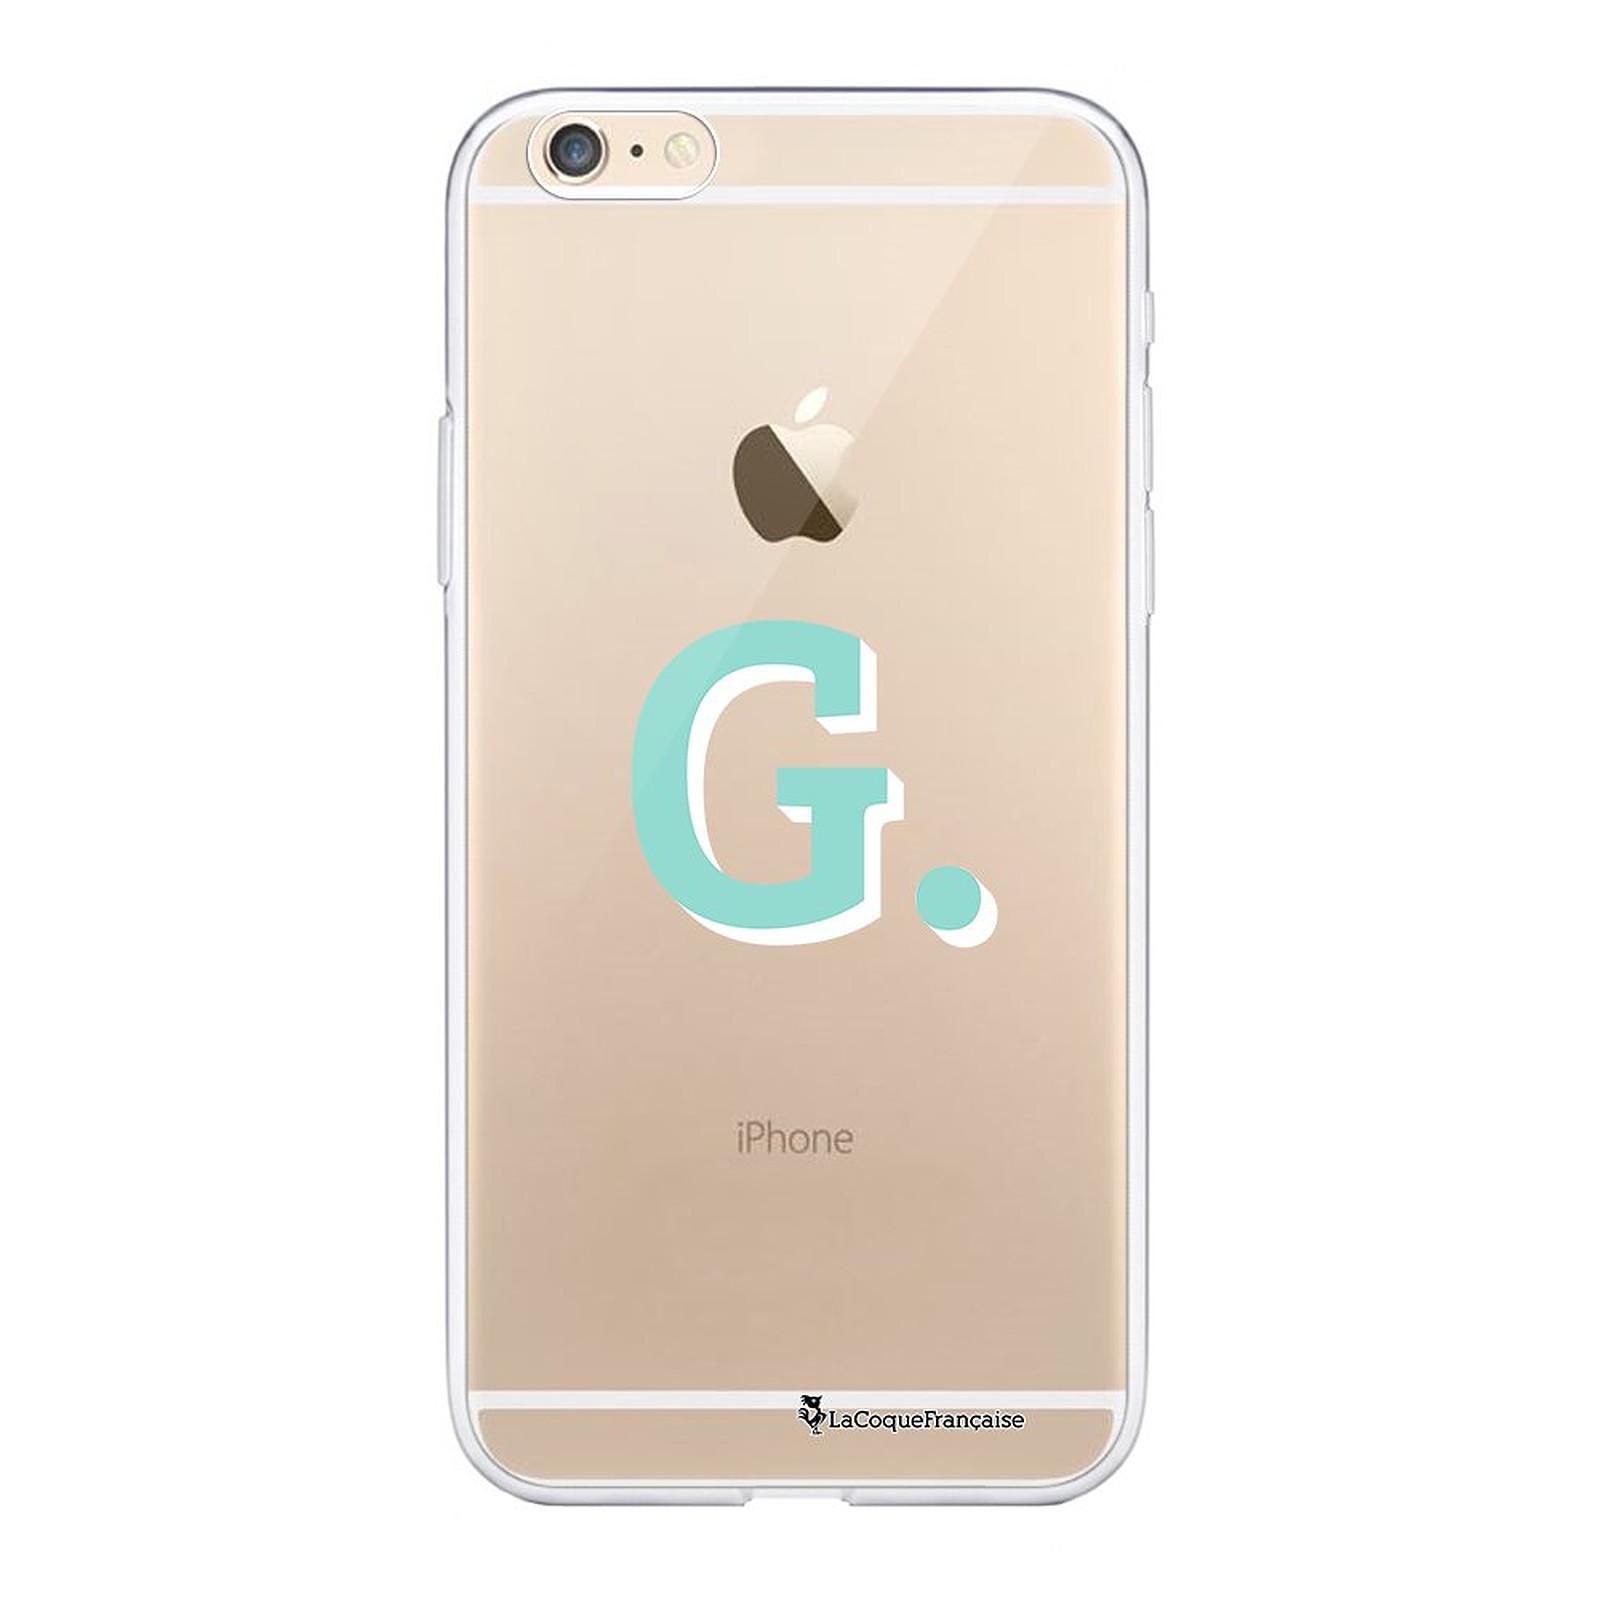 LA COQUE FRANCAISE Coque iPhone 6 Plus / 6S Plus 360 intégrale transparente Initiale G Tendance